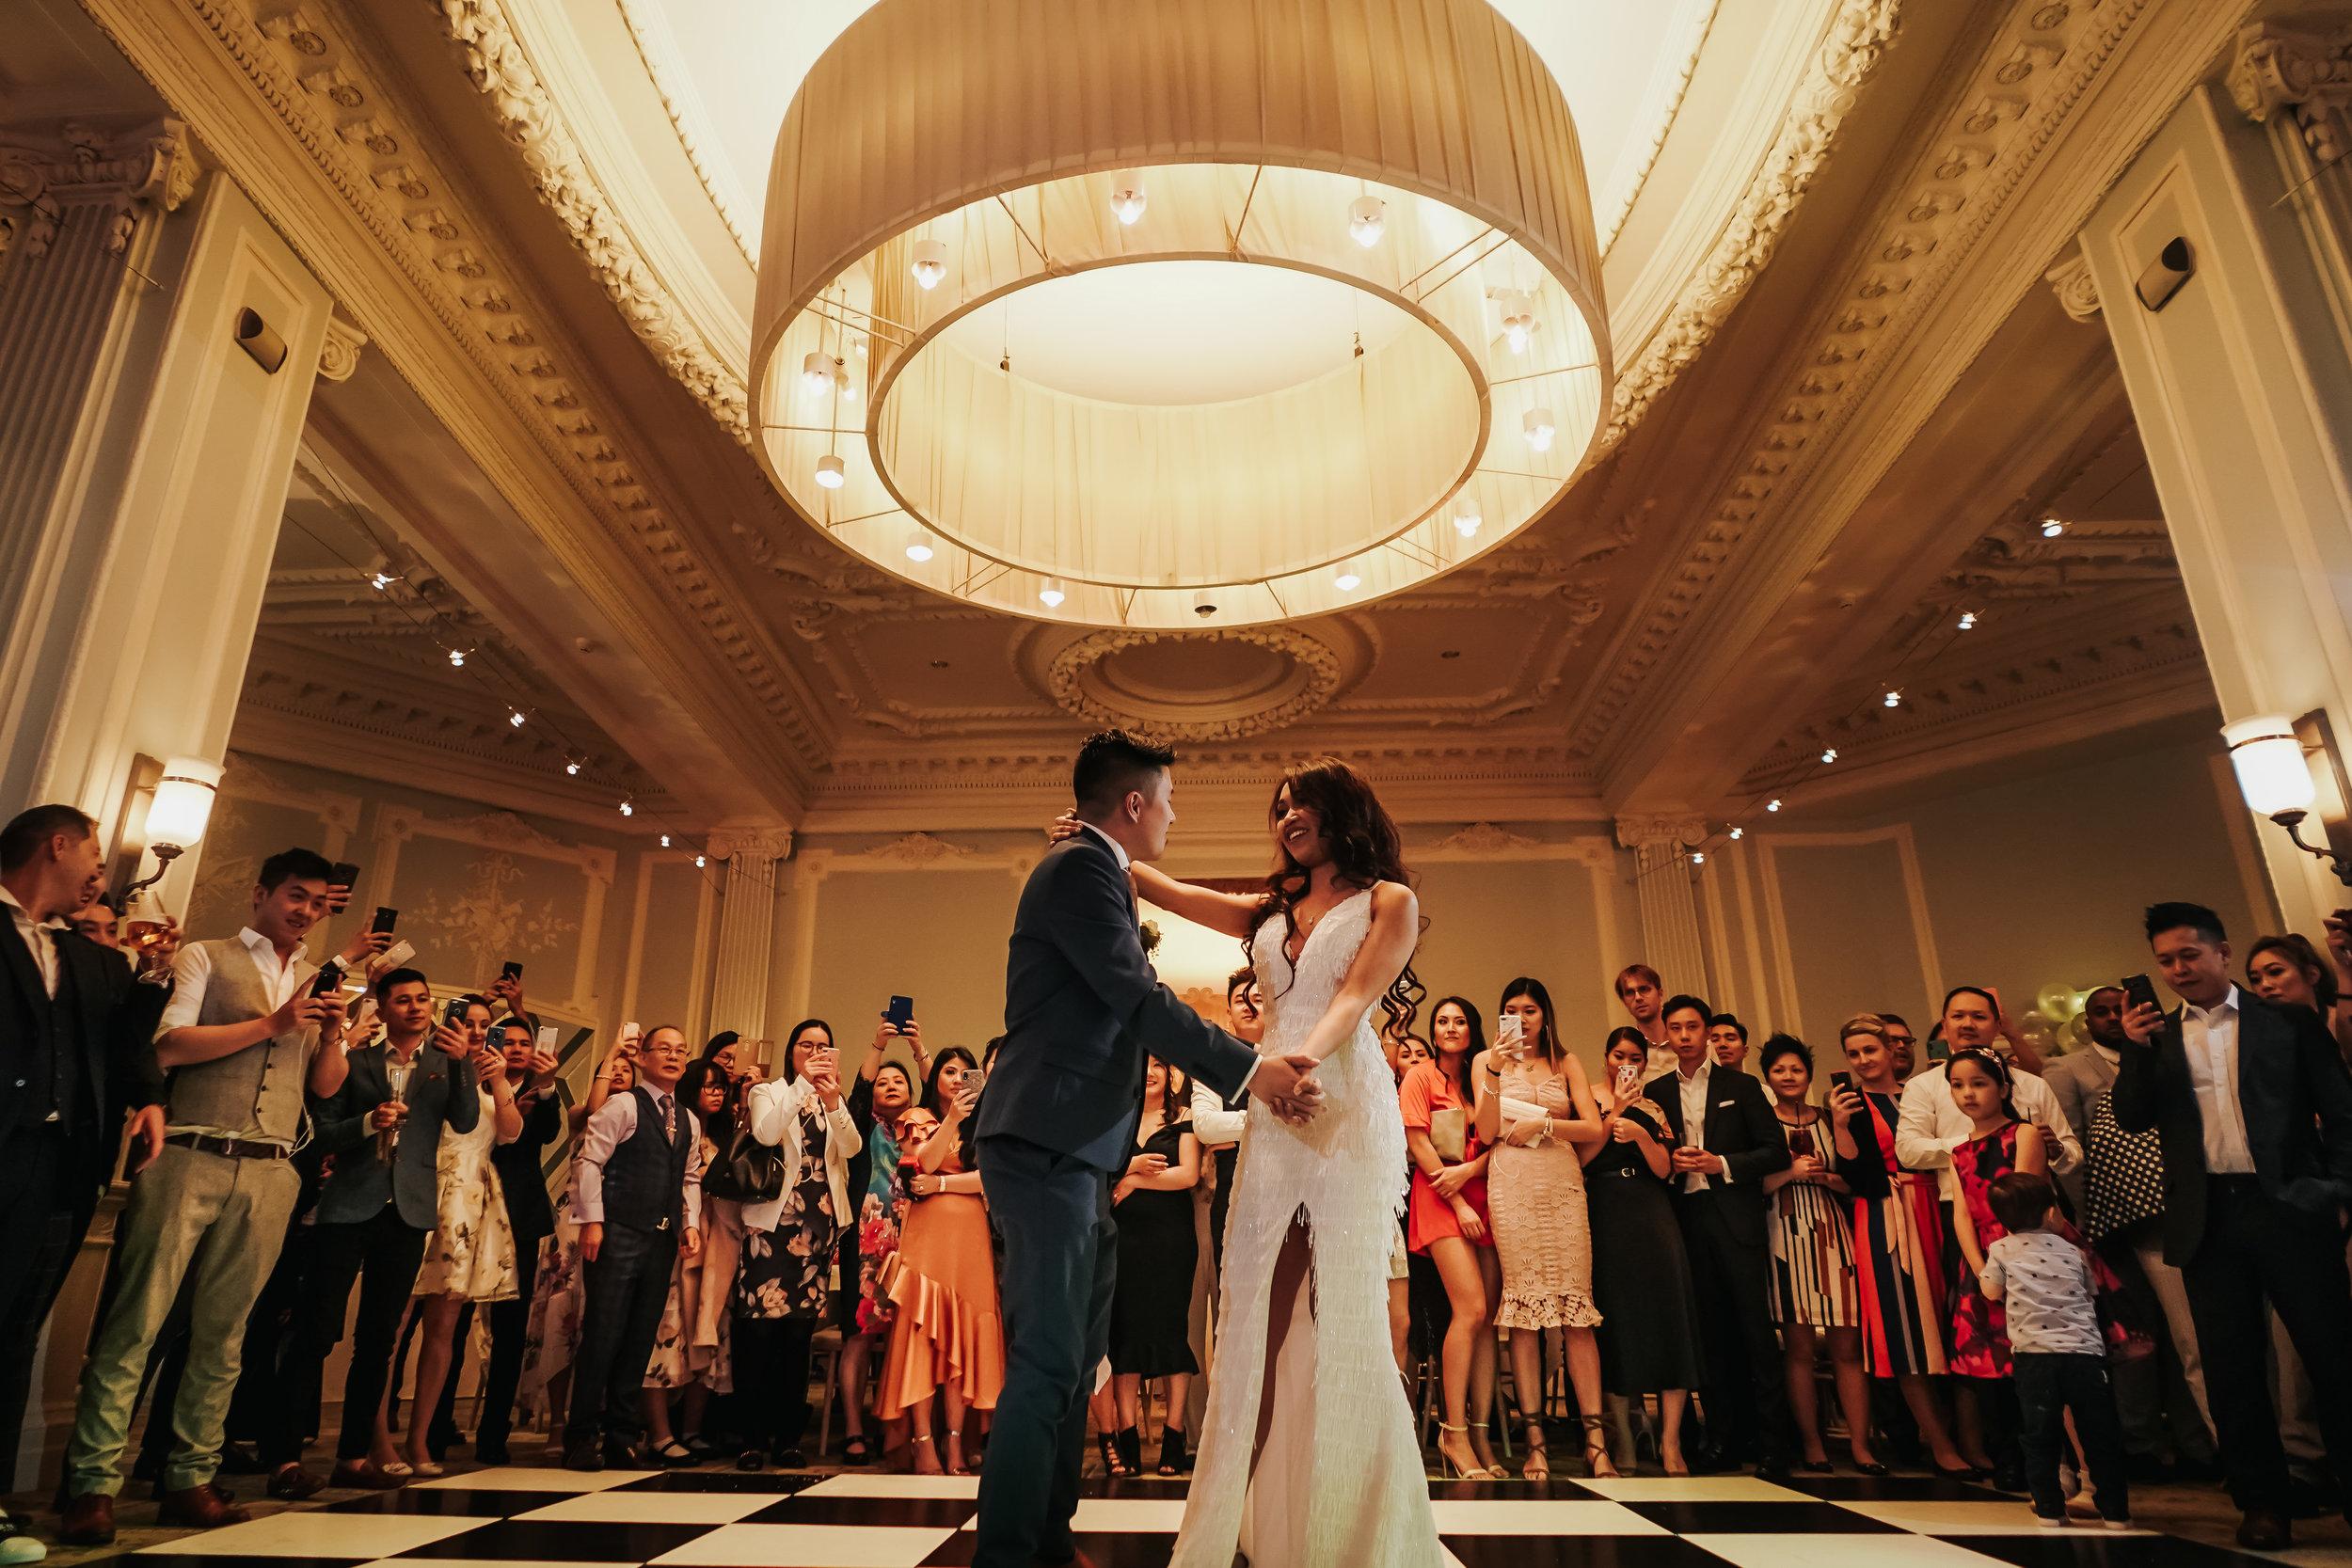 Chinese Wedding Photography Manchester wedding photographer Cheshire - 054.jpg